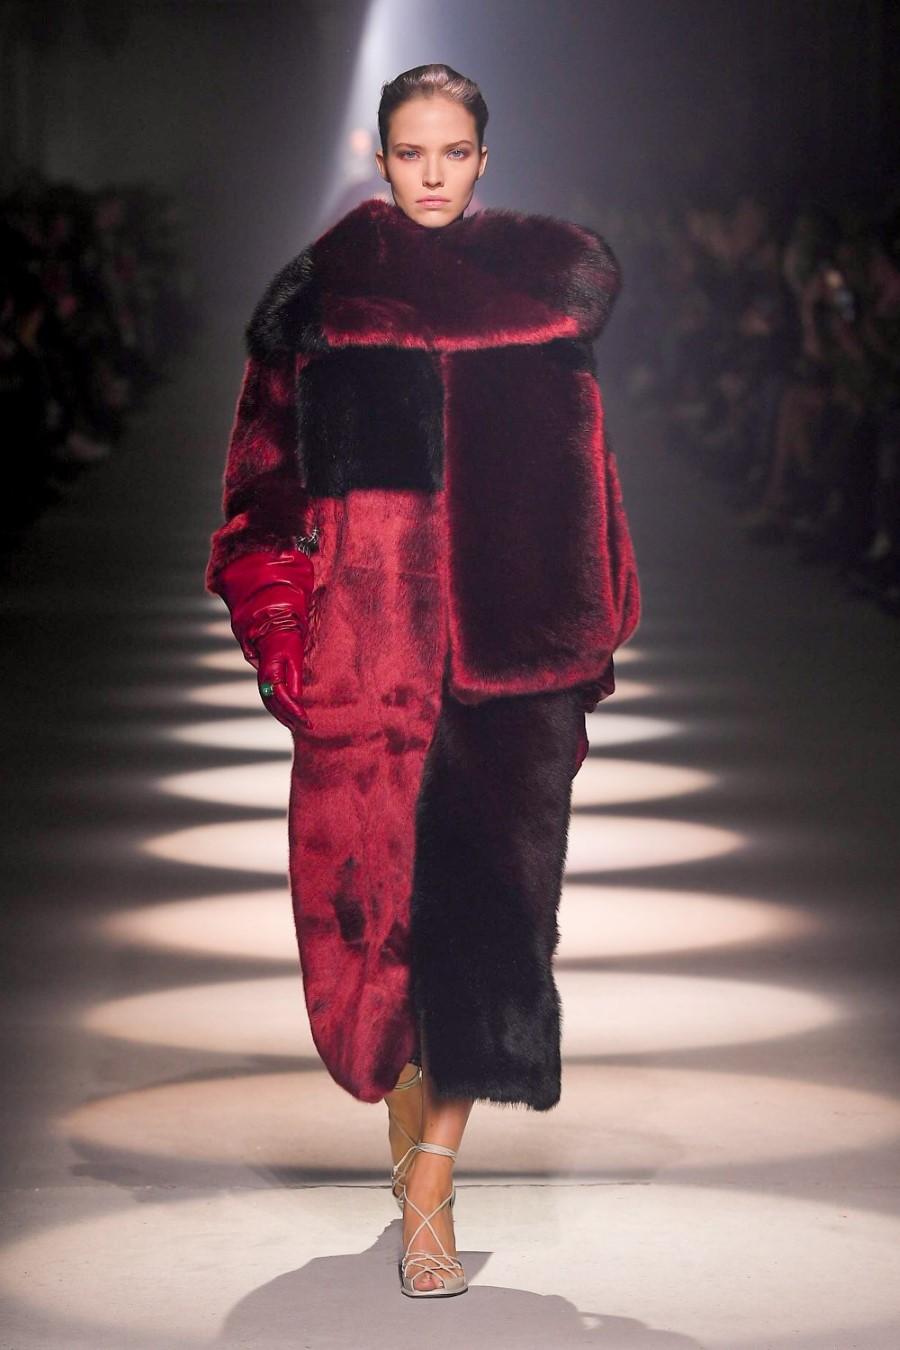 Givenchy - Fall/Winter 2020 - Paris Fashion Week